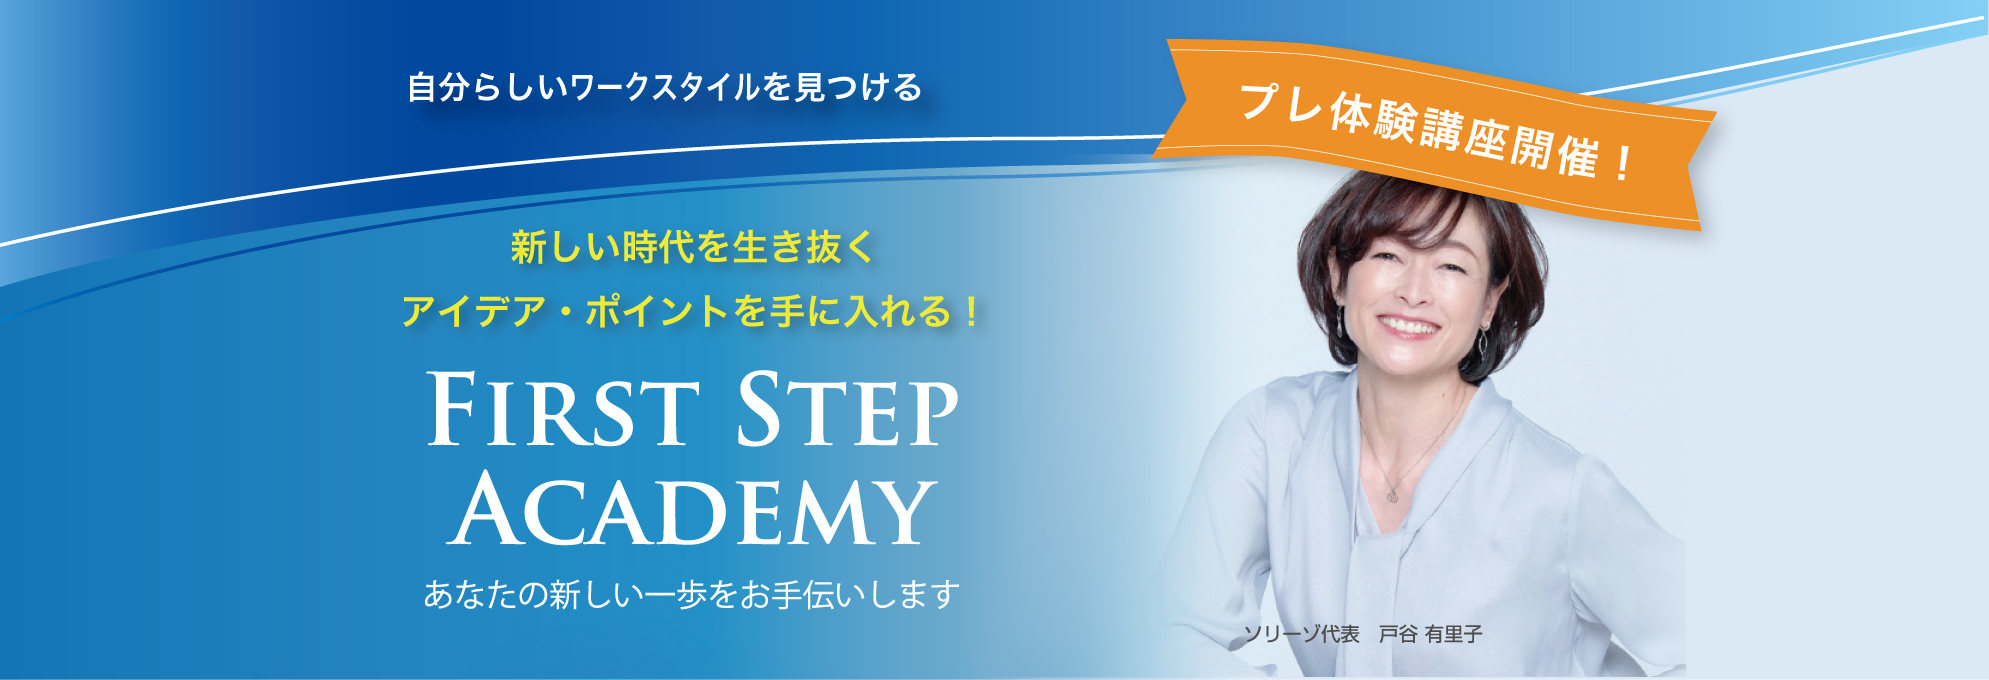 First Step Academy あなたの新しい一歩をお手伝いします